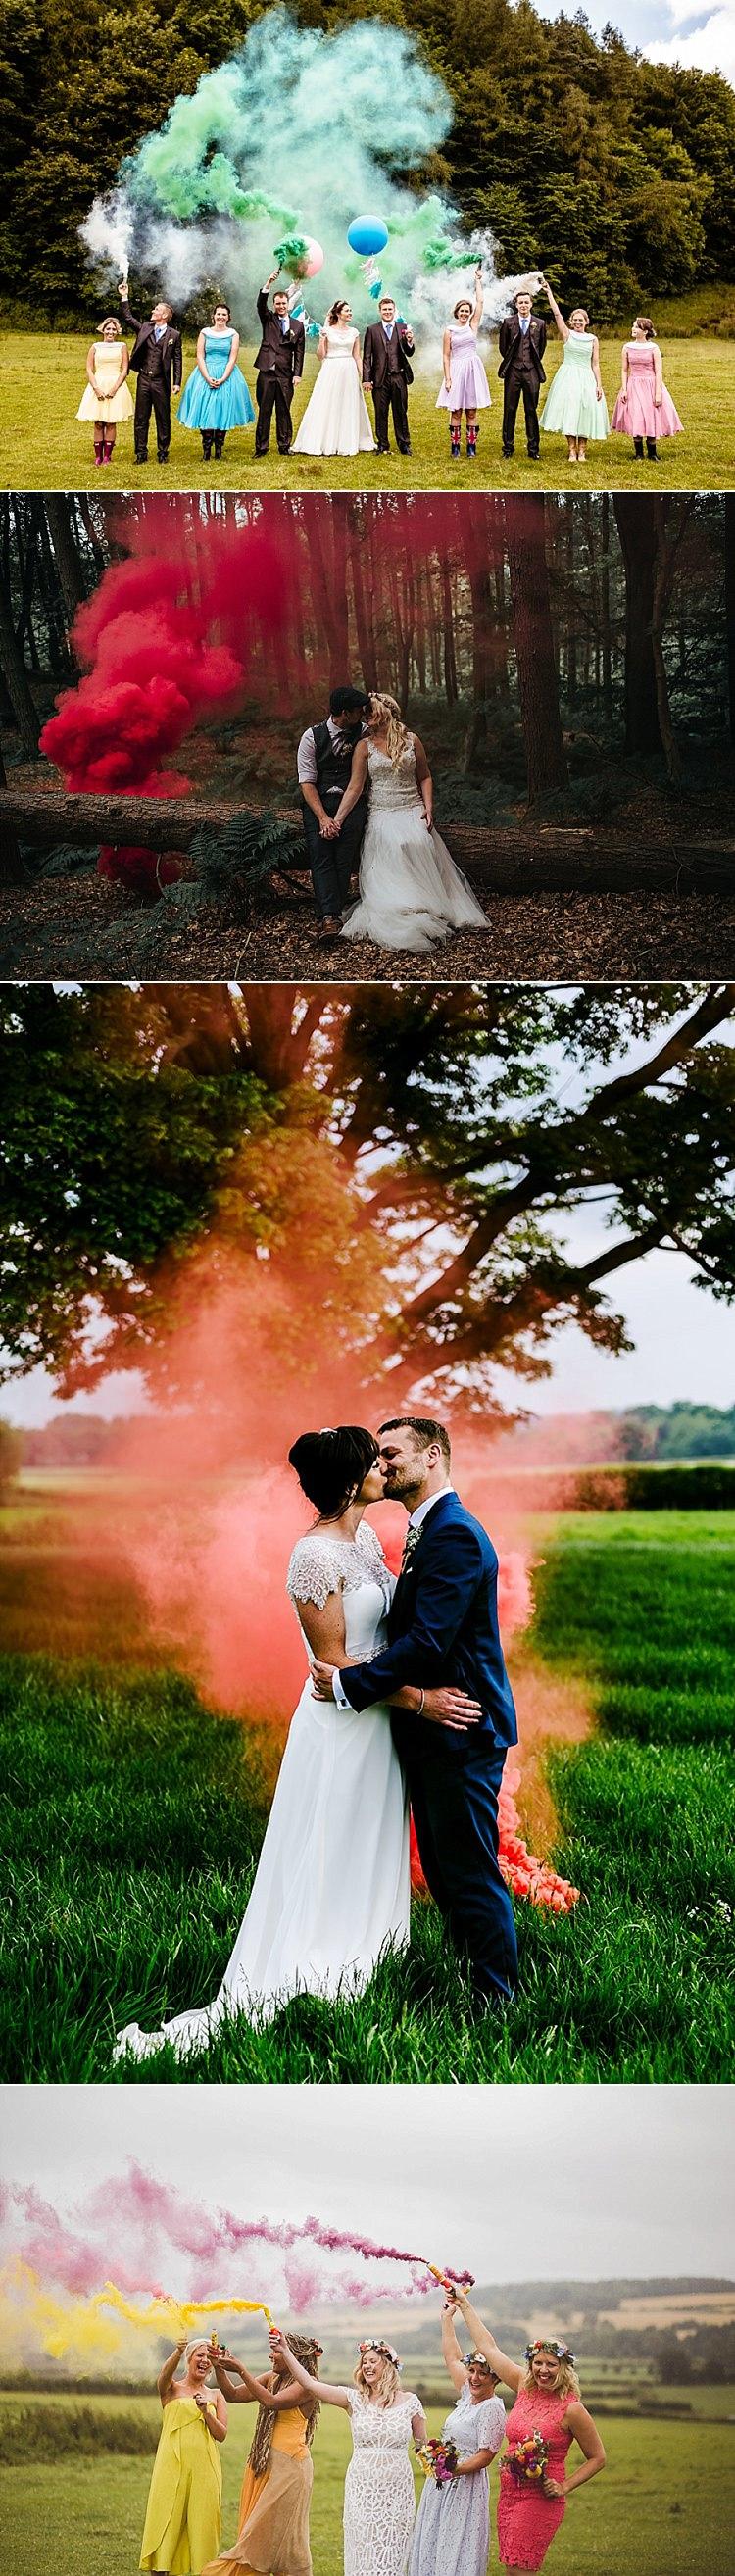 Why We Love Smoke Bomb Wedding Photographs | Whimsical